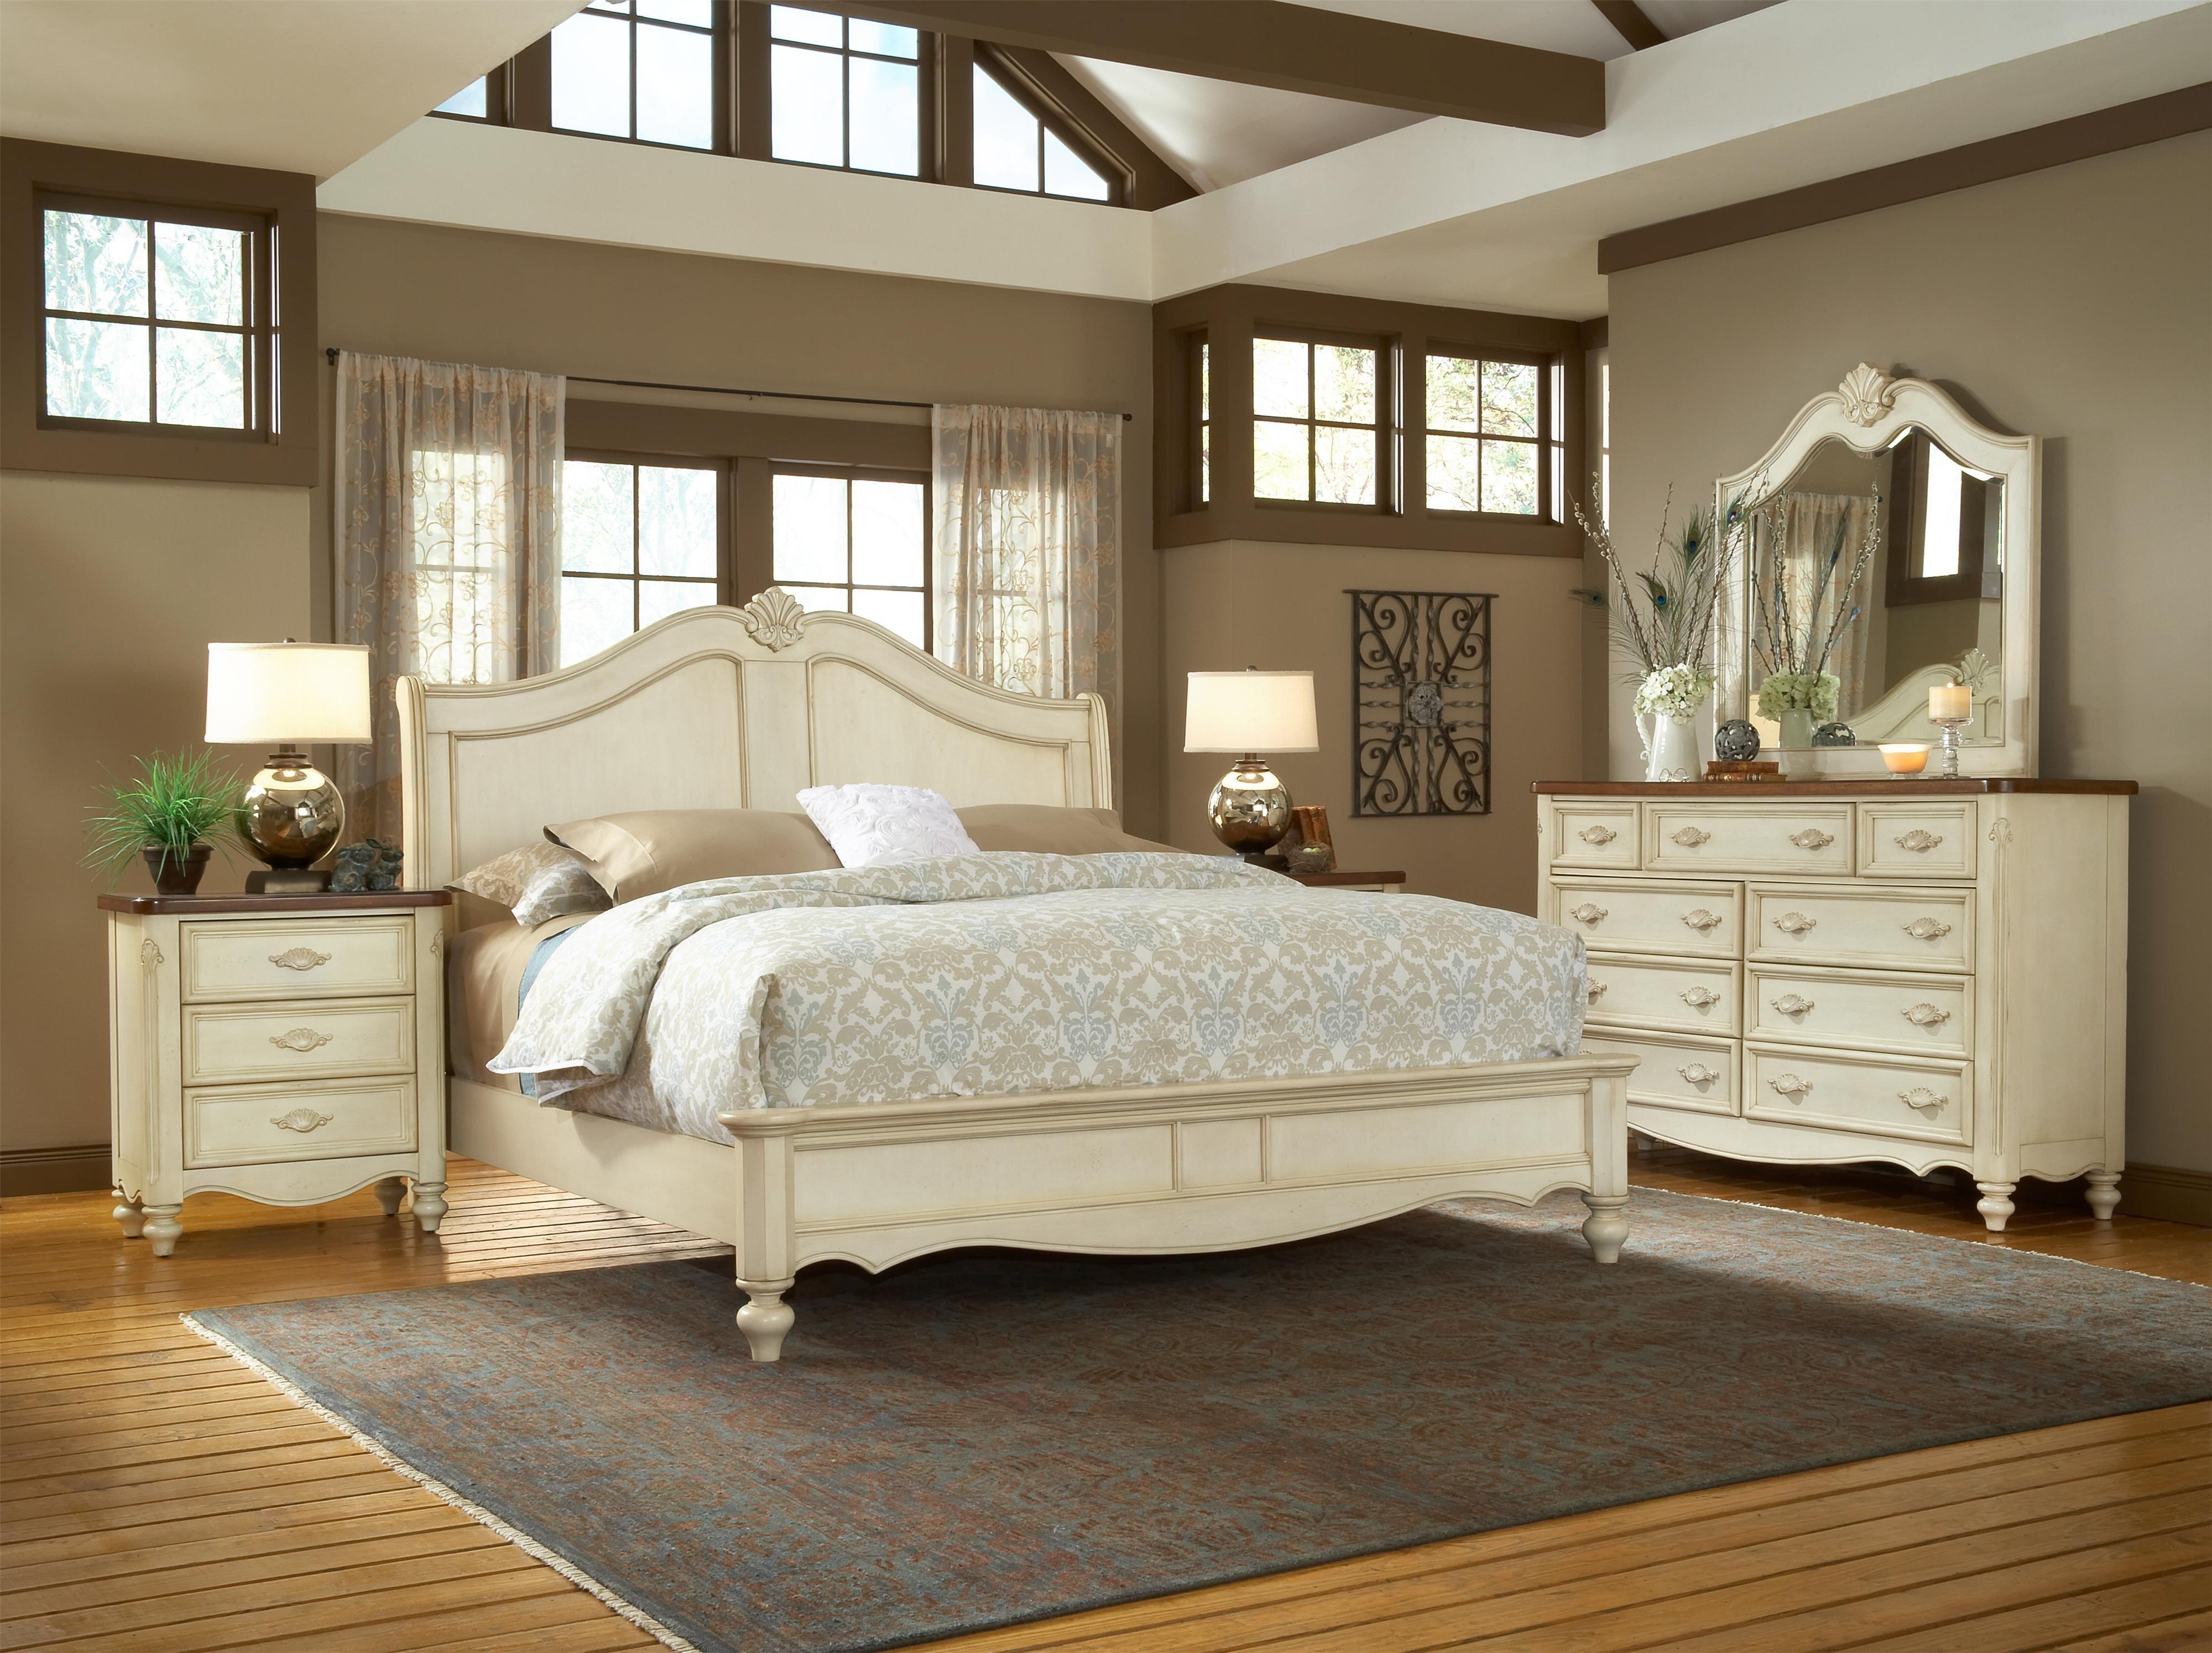 The Dump Bedroom Set Luxury Chateau Queen Bedroom Group